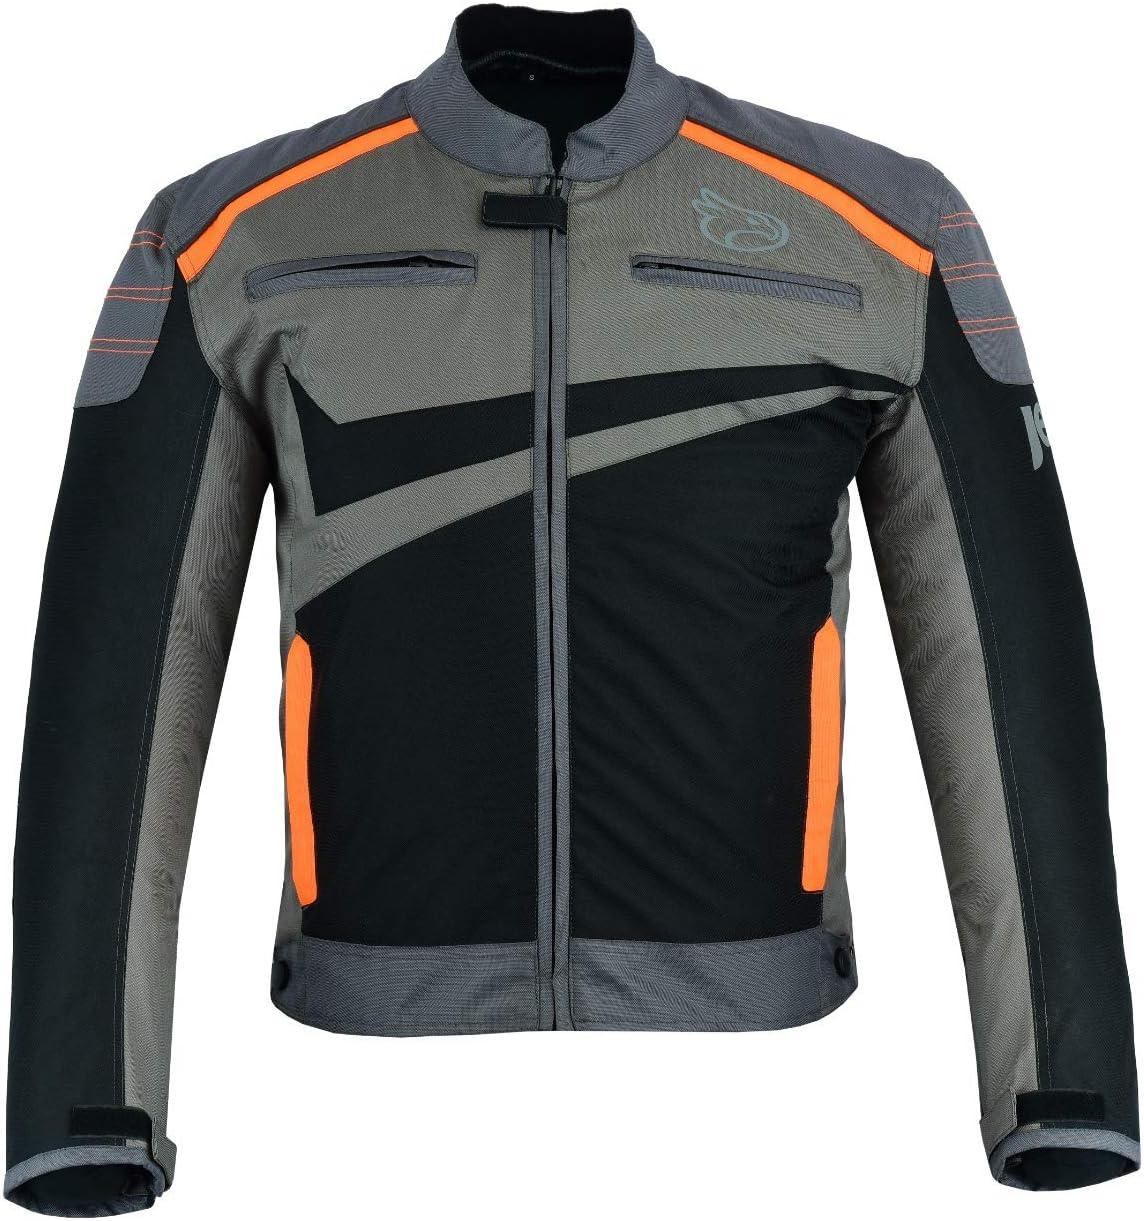 XL , Grau Orange EU 52-54 Jet Motorradjacke Motoradkleidung Rollerjacke Mopedjacke Herren Mit Sommer Protektoren Textil Leichtbau Bel/üftung Basic ESSENTIALS